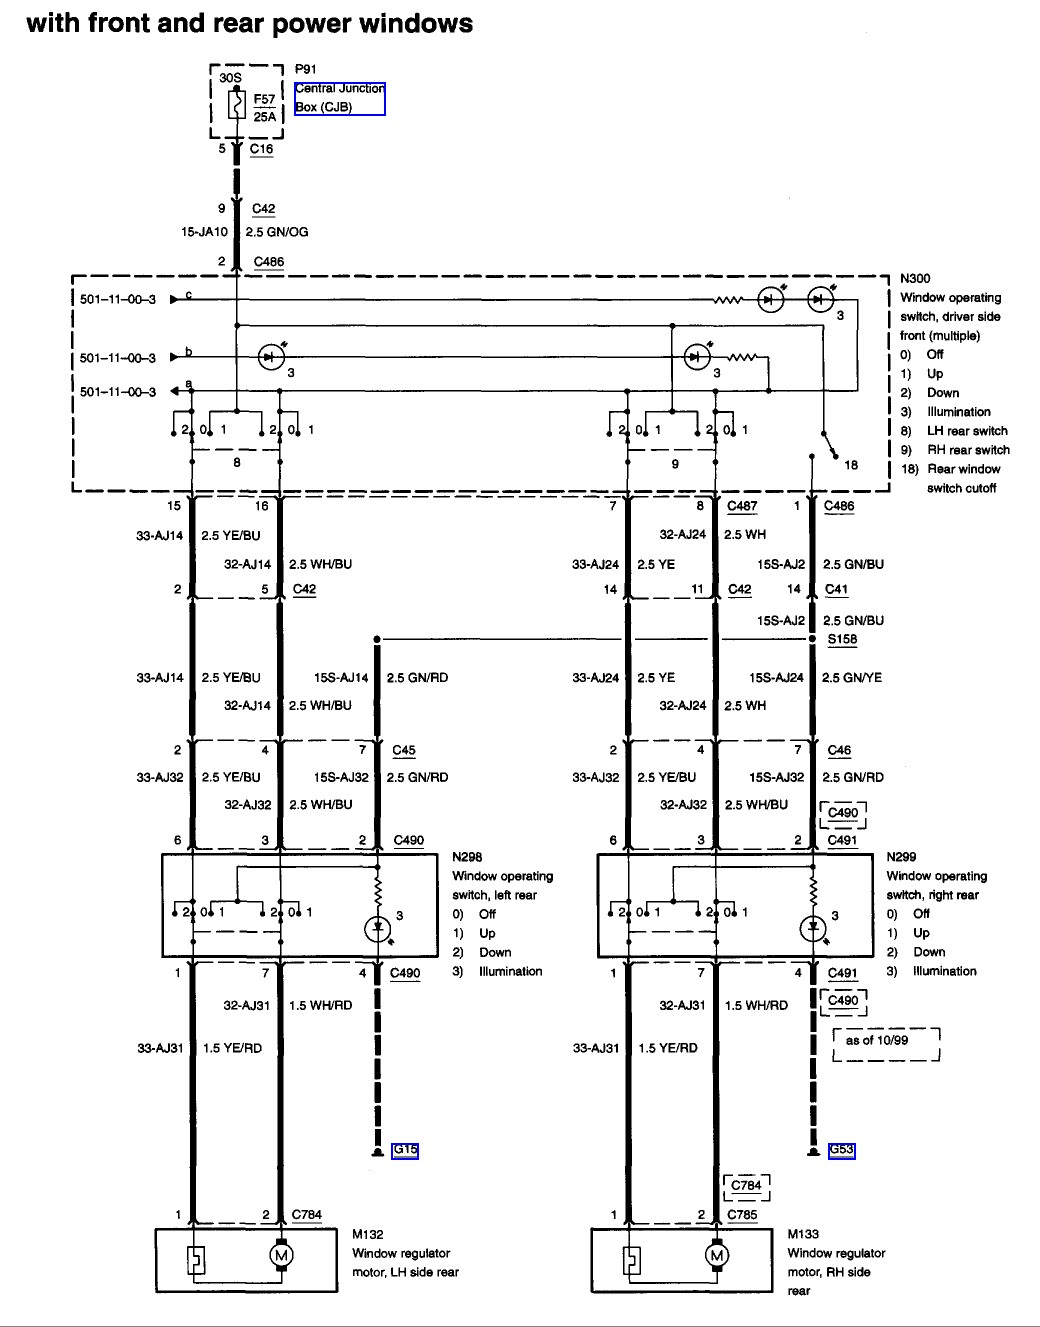 Ford F150 Power Window Switch Wiring Diagram Electrical Need For Switcheswindow14jpg Inspirational Image Specialty Windows